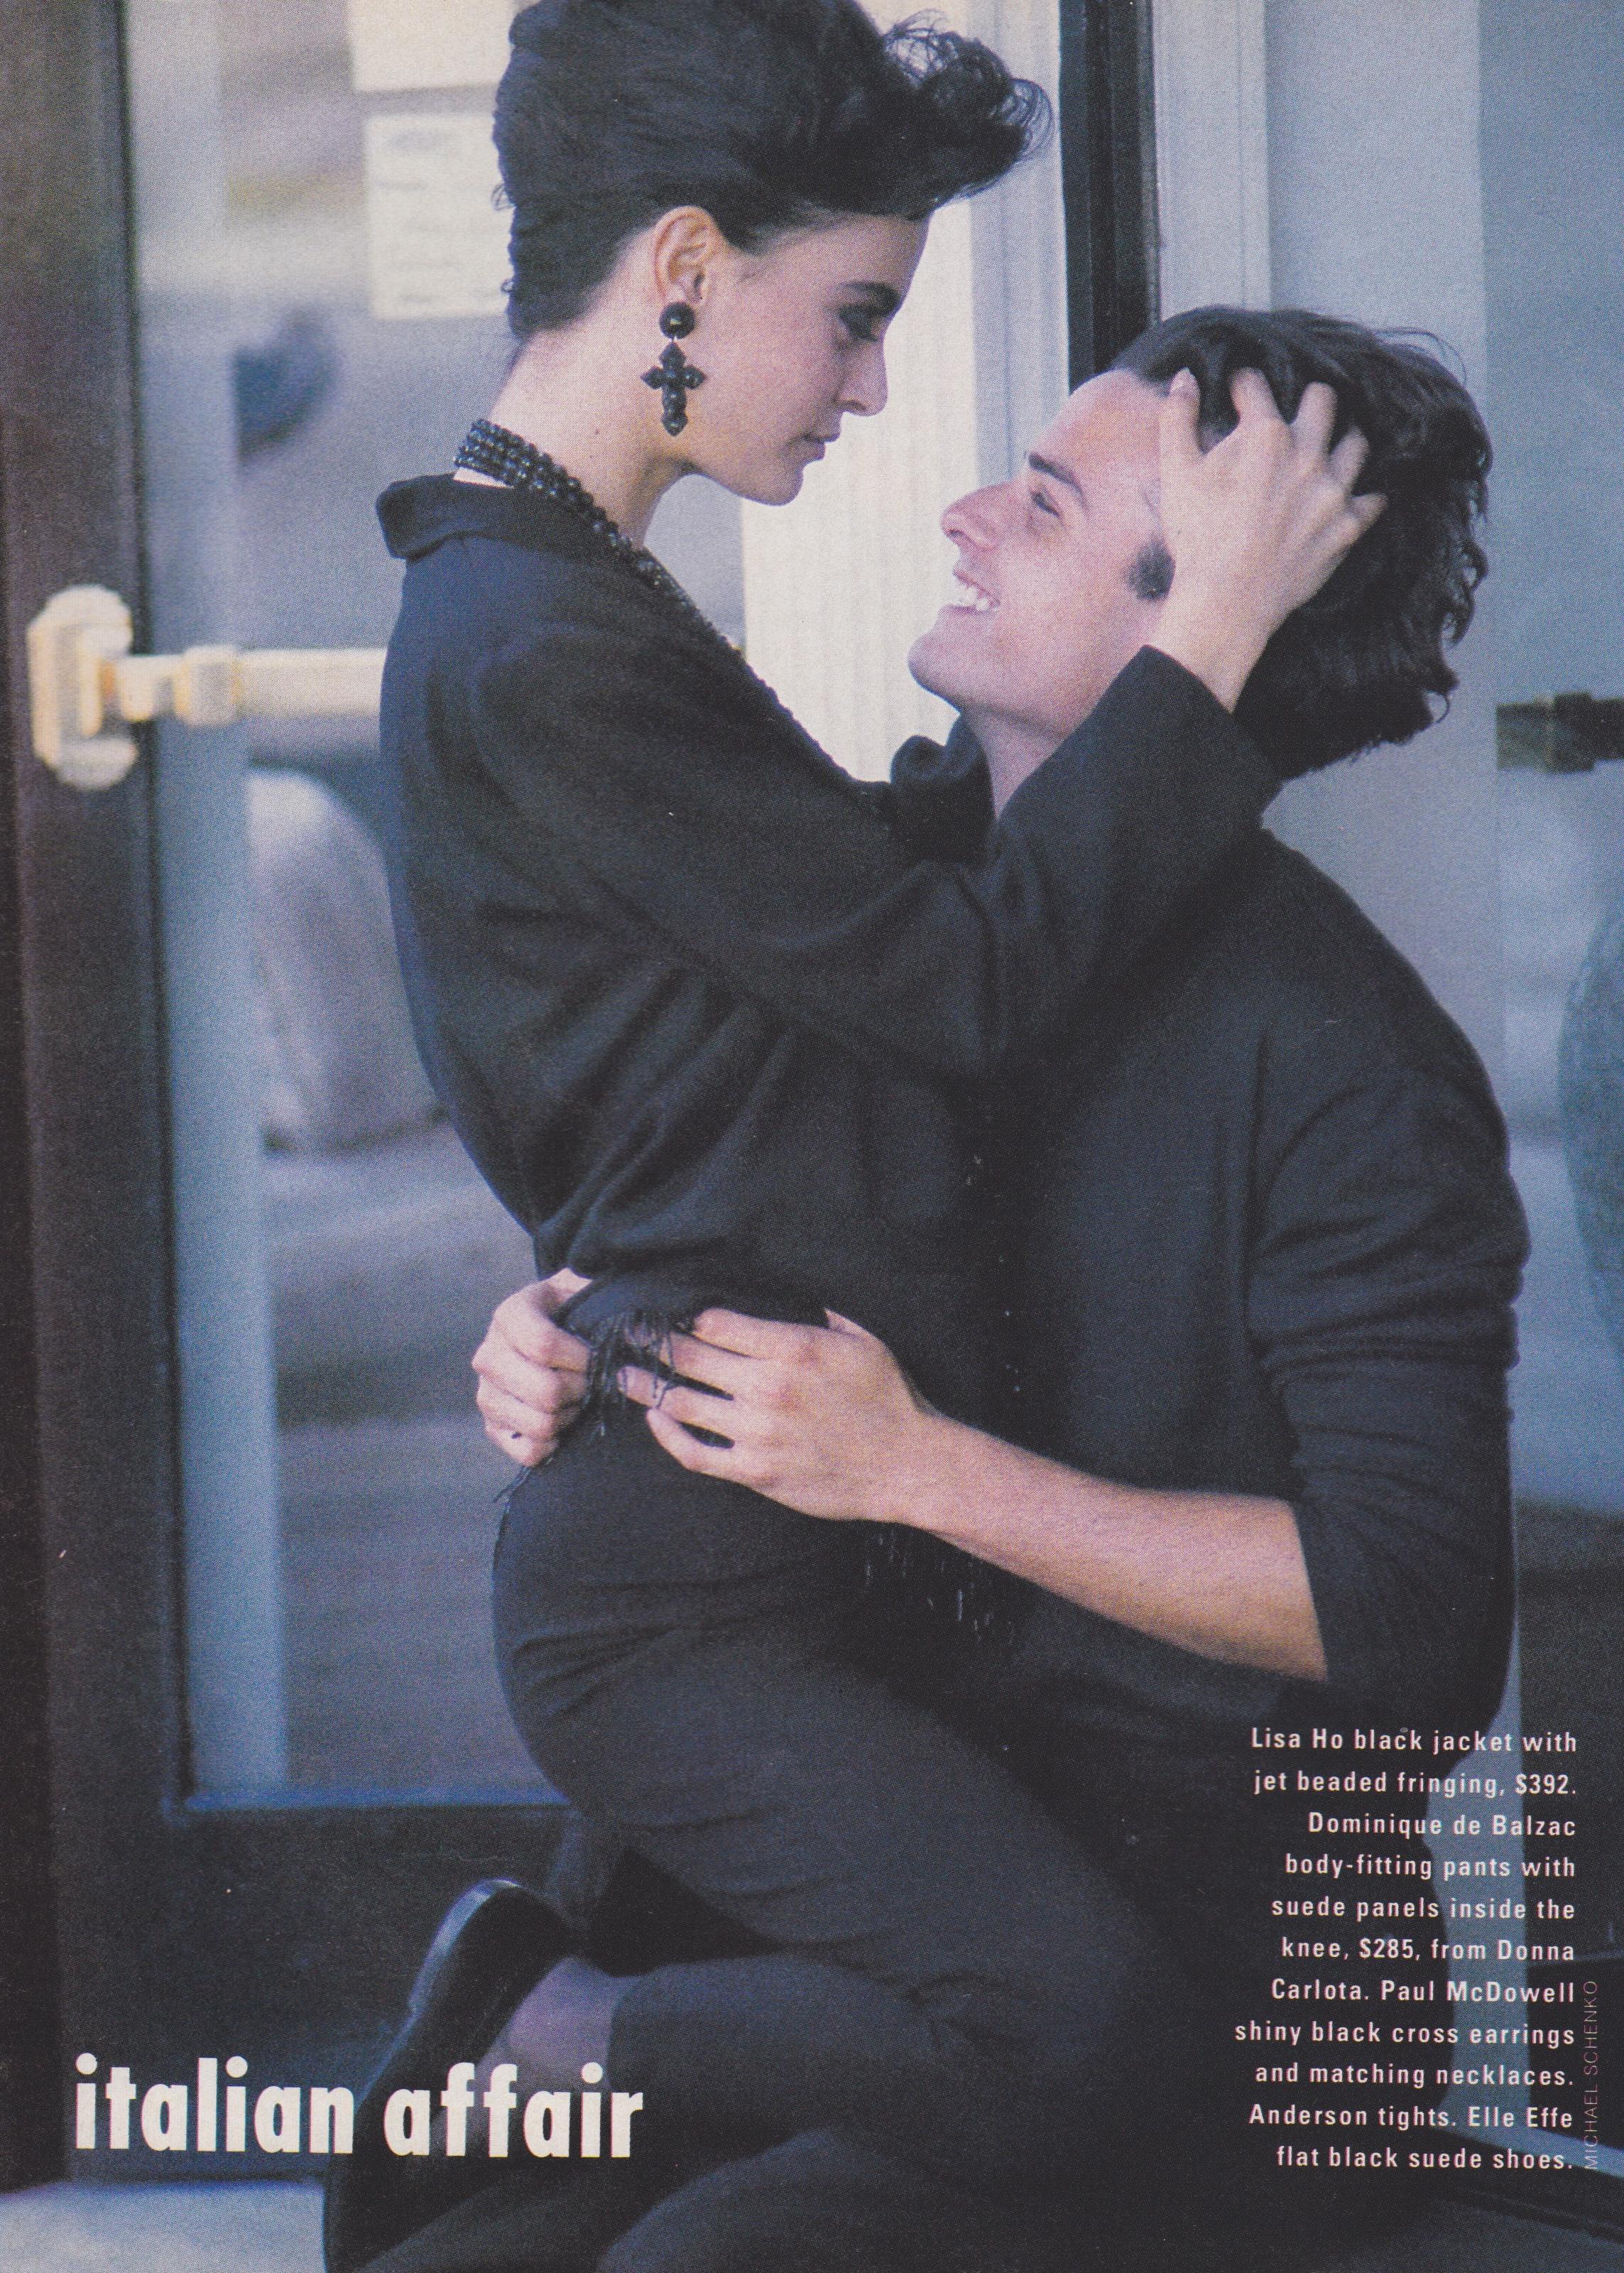 Cosmo June 1990 | International Style 11.jpeg